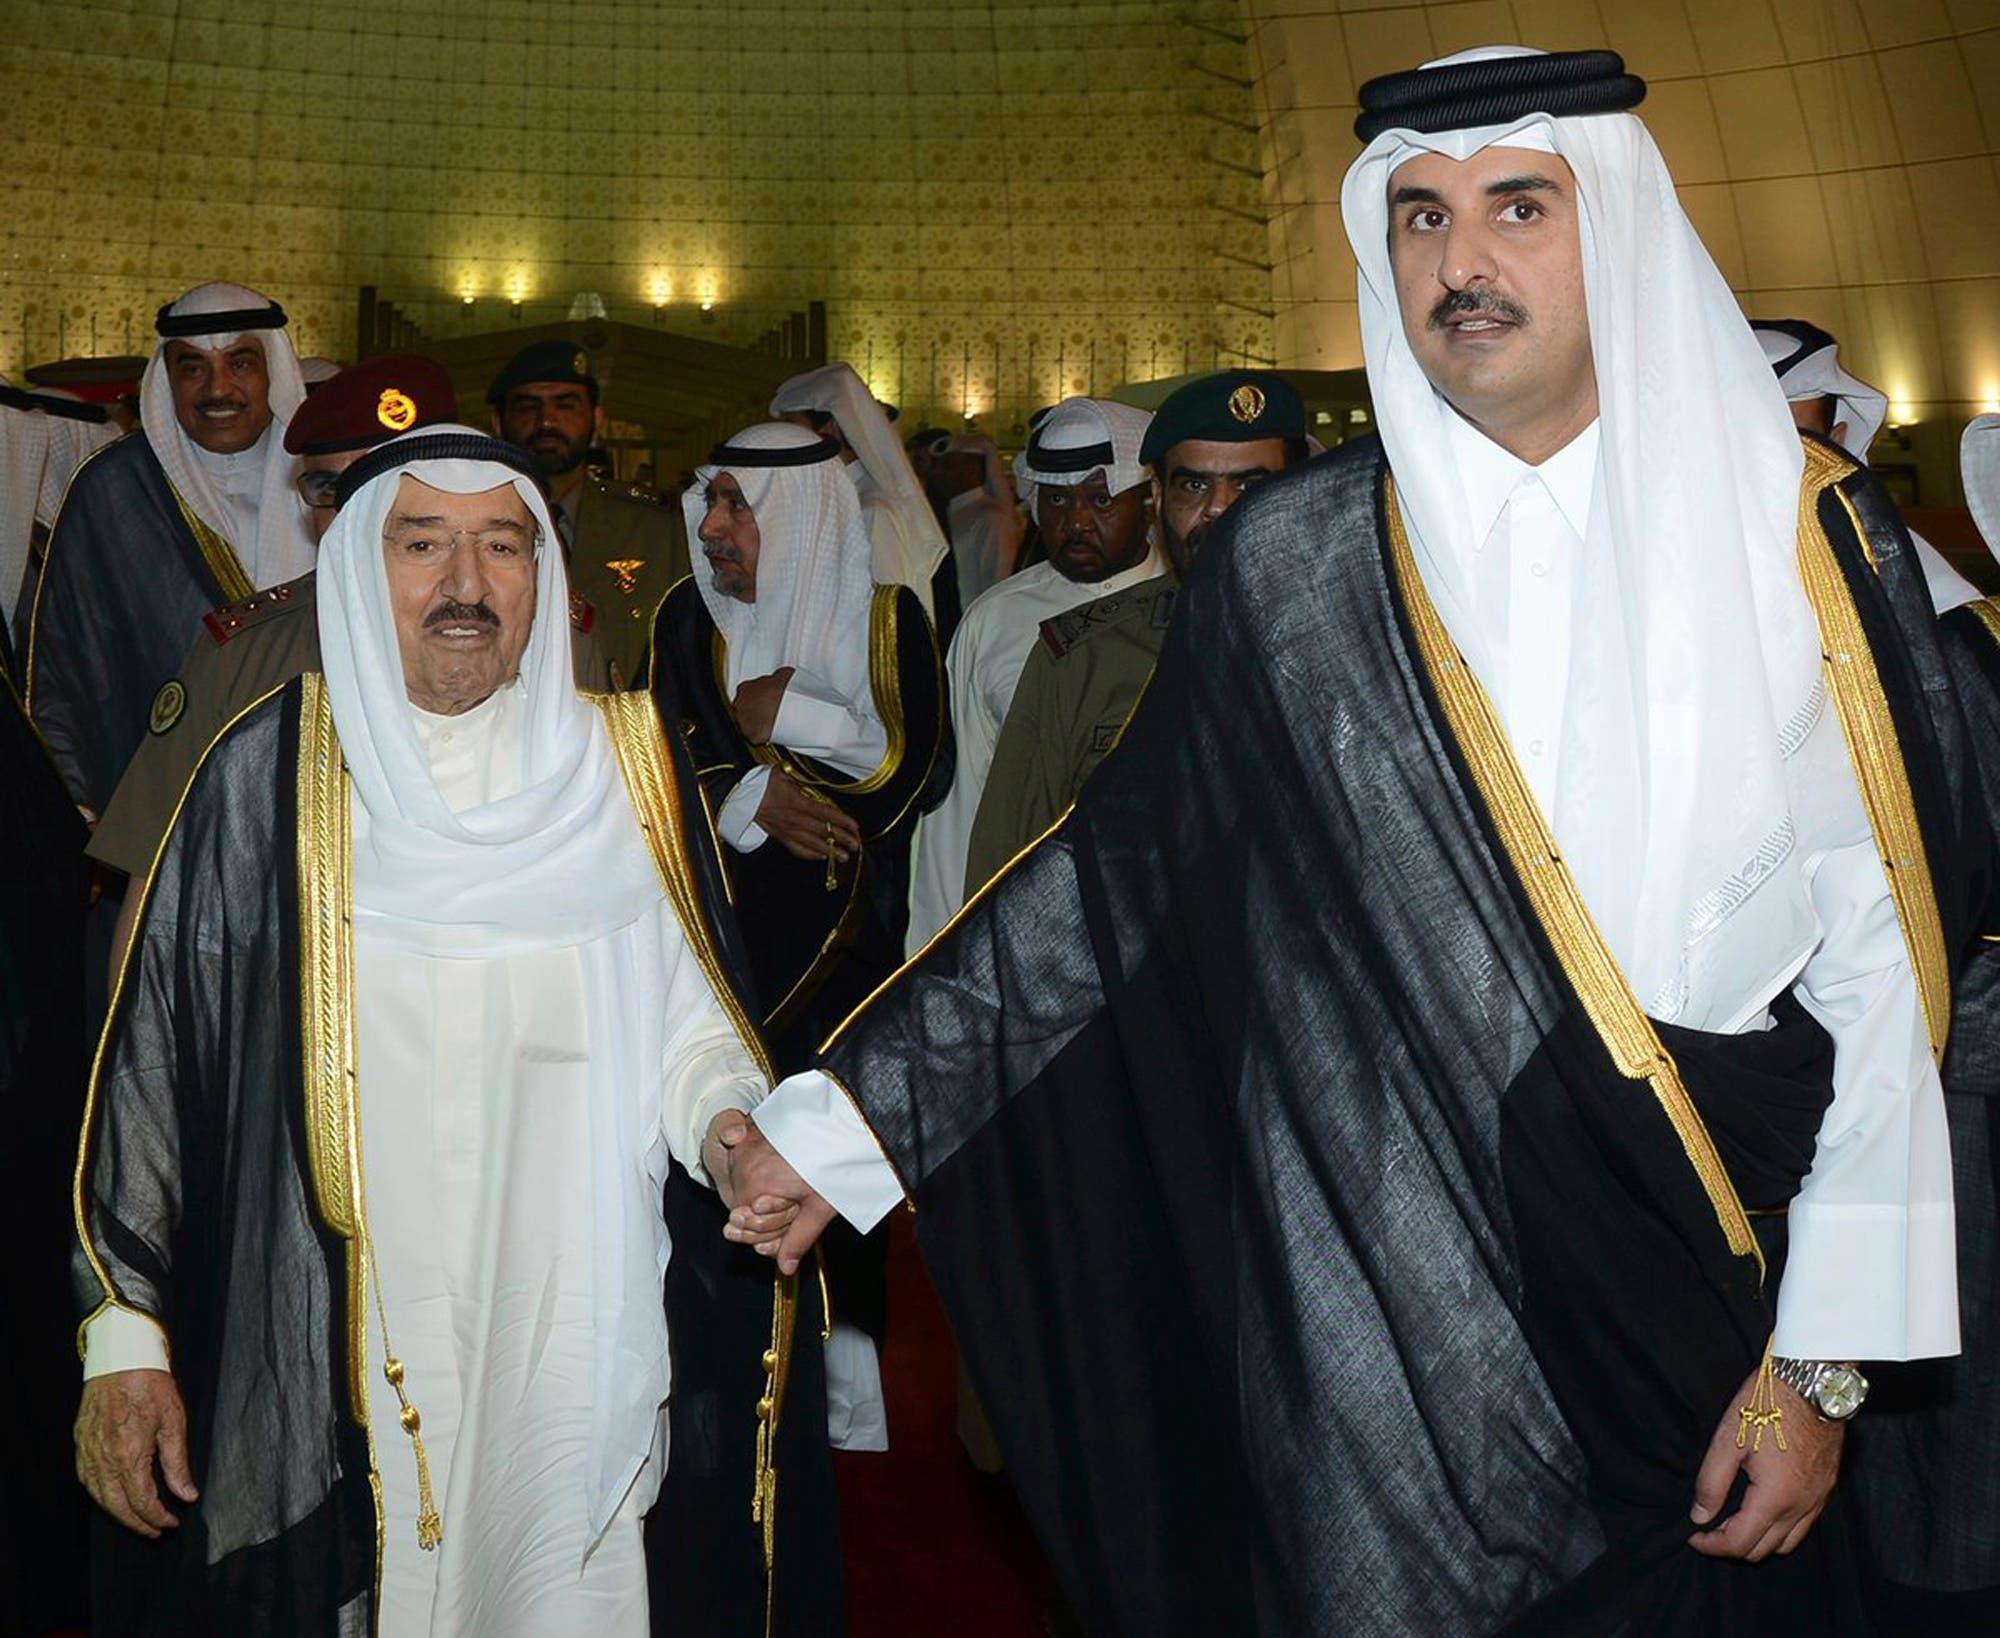 In this June 7, 2017 file photo released by Kuwait News Agency, KUNA, Kuwait's Emir Sheikh Sabah Al Ahmad Al Sabah, left, holds the hand of Qatar's Emir Sheikh Tamim bin Hamad Al Thani in Doha, Qatar. (AP)